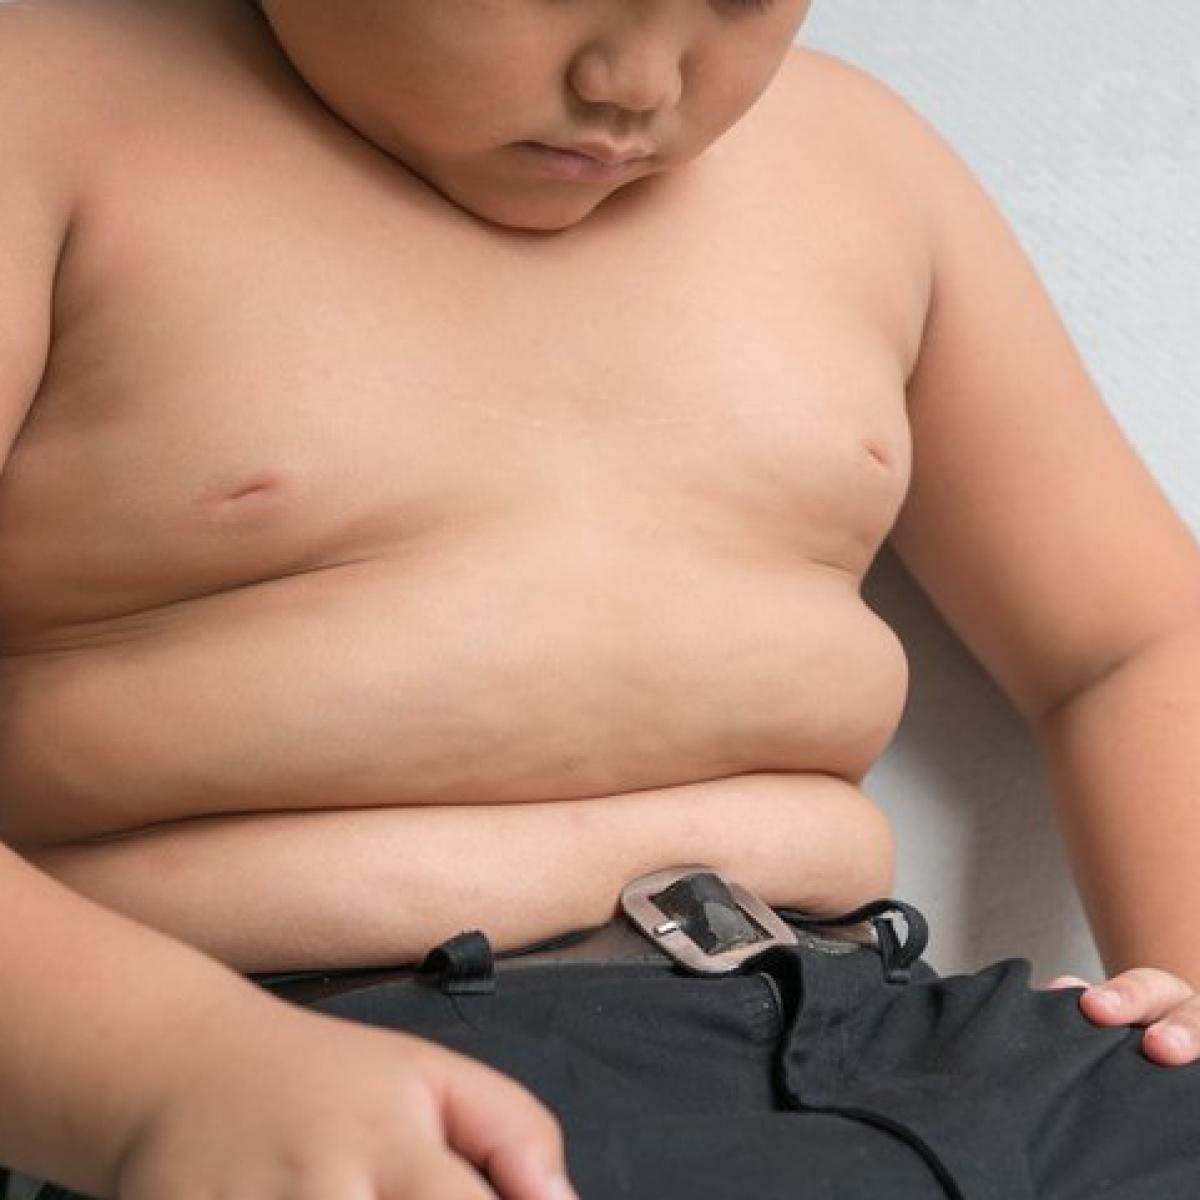 Childhood obesity may increase bladder cancer risk